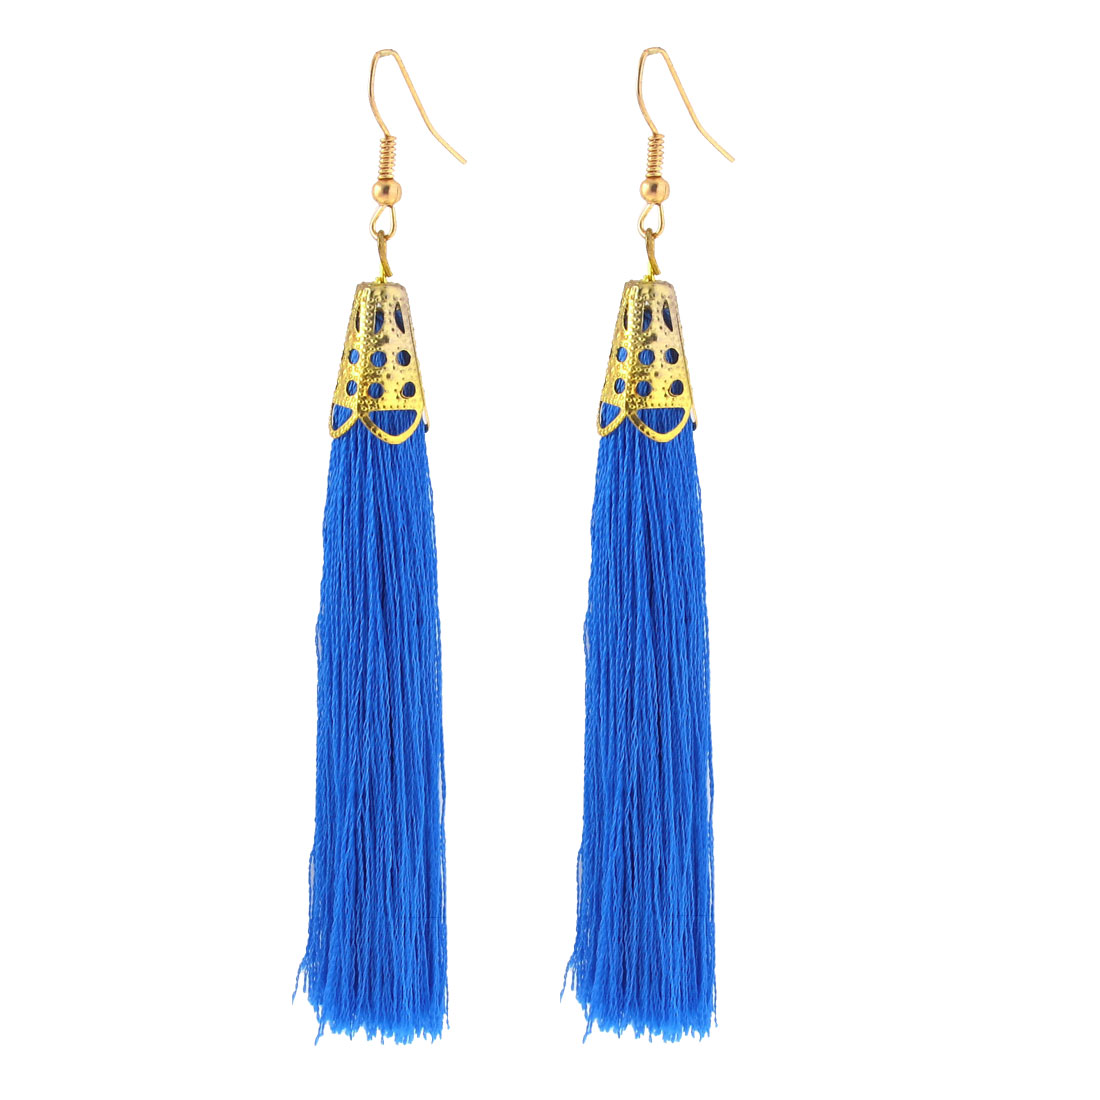 Gold Tone Fish Hook Long Nylon Tassel Drop Earrings Eardrop 2 Pcs Blue